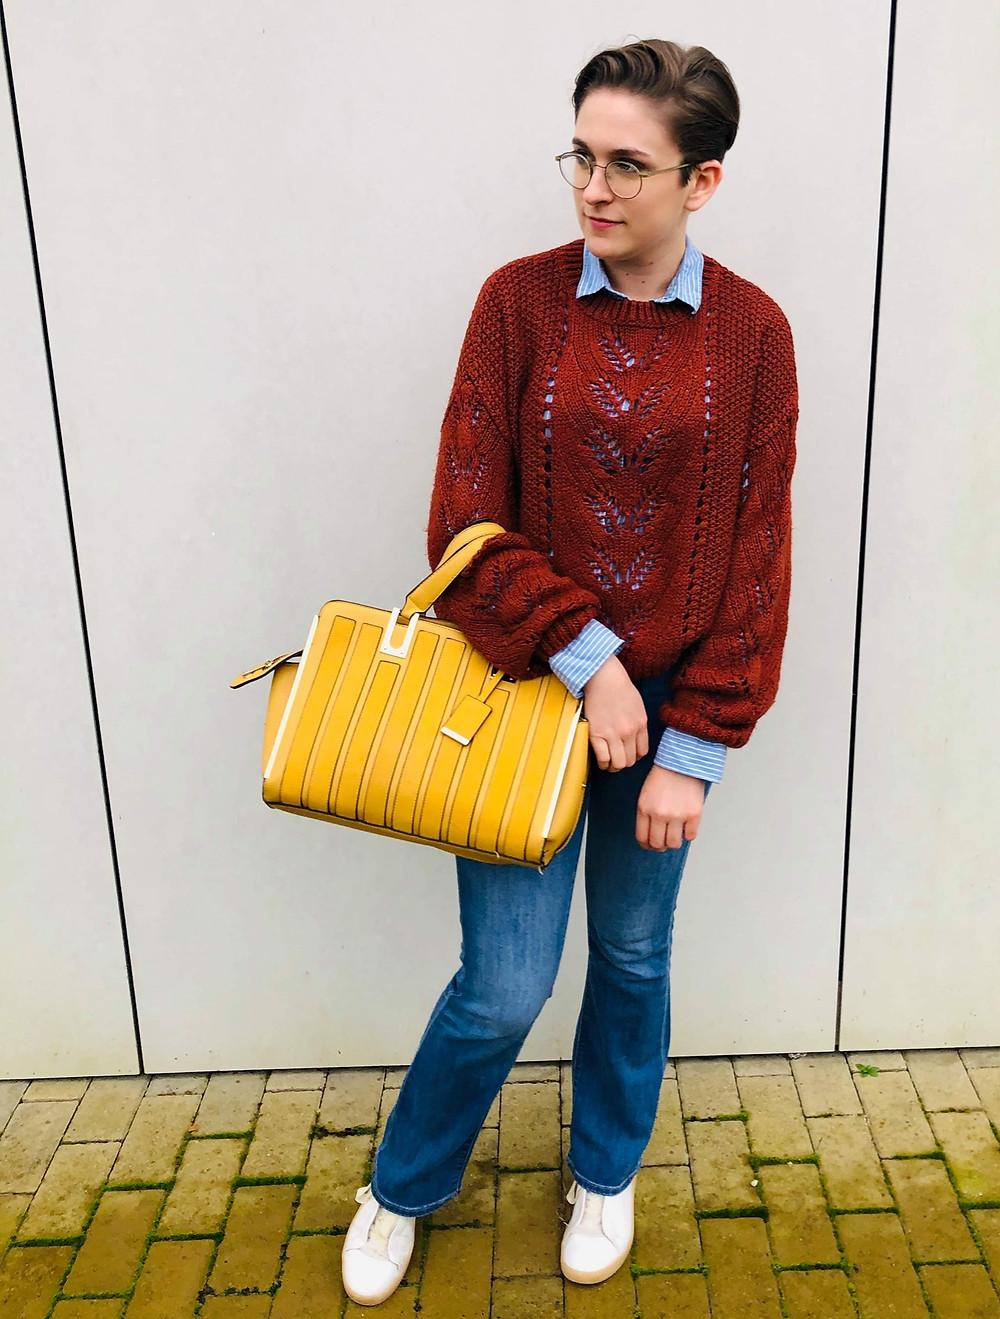 peter pan collared jumper and mustard bag